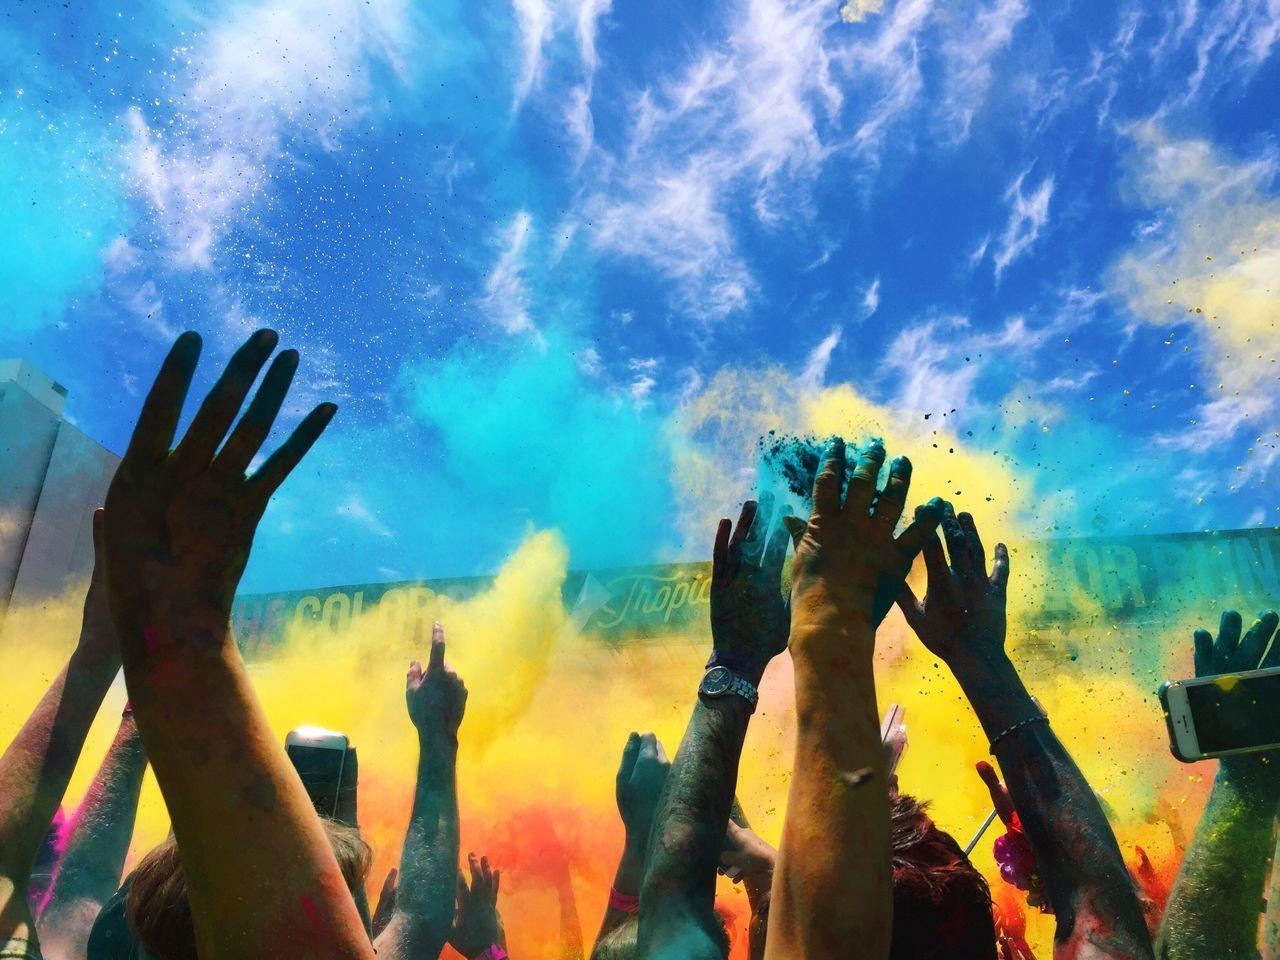 My Year My View Colour Run 2016 Perth Crowd Outdoors Colours Perth Run 5k Australia Perth CBD Vscocam